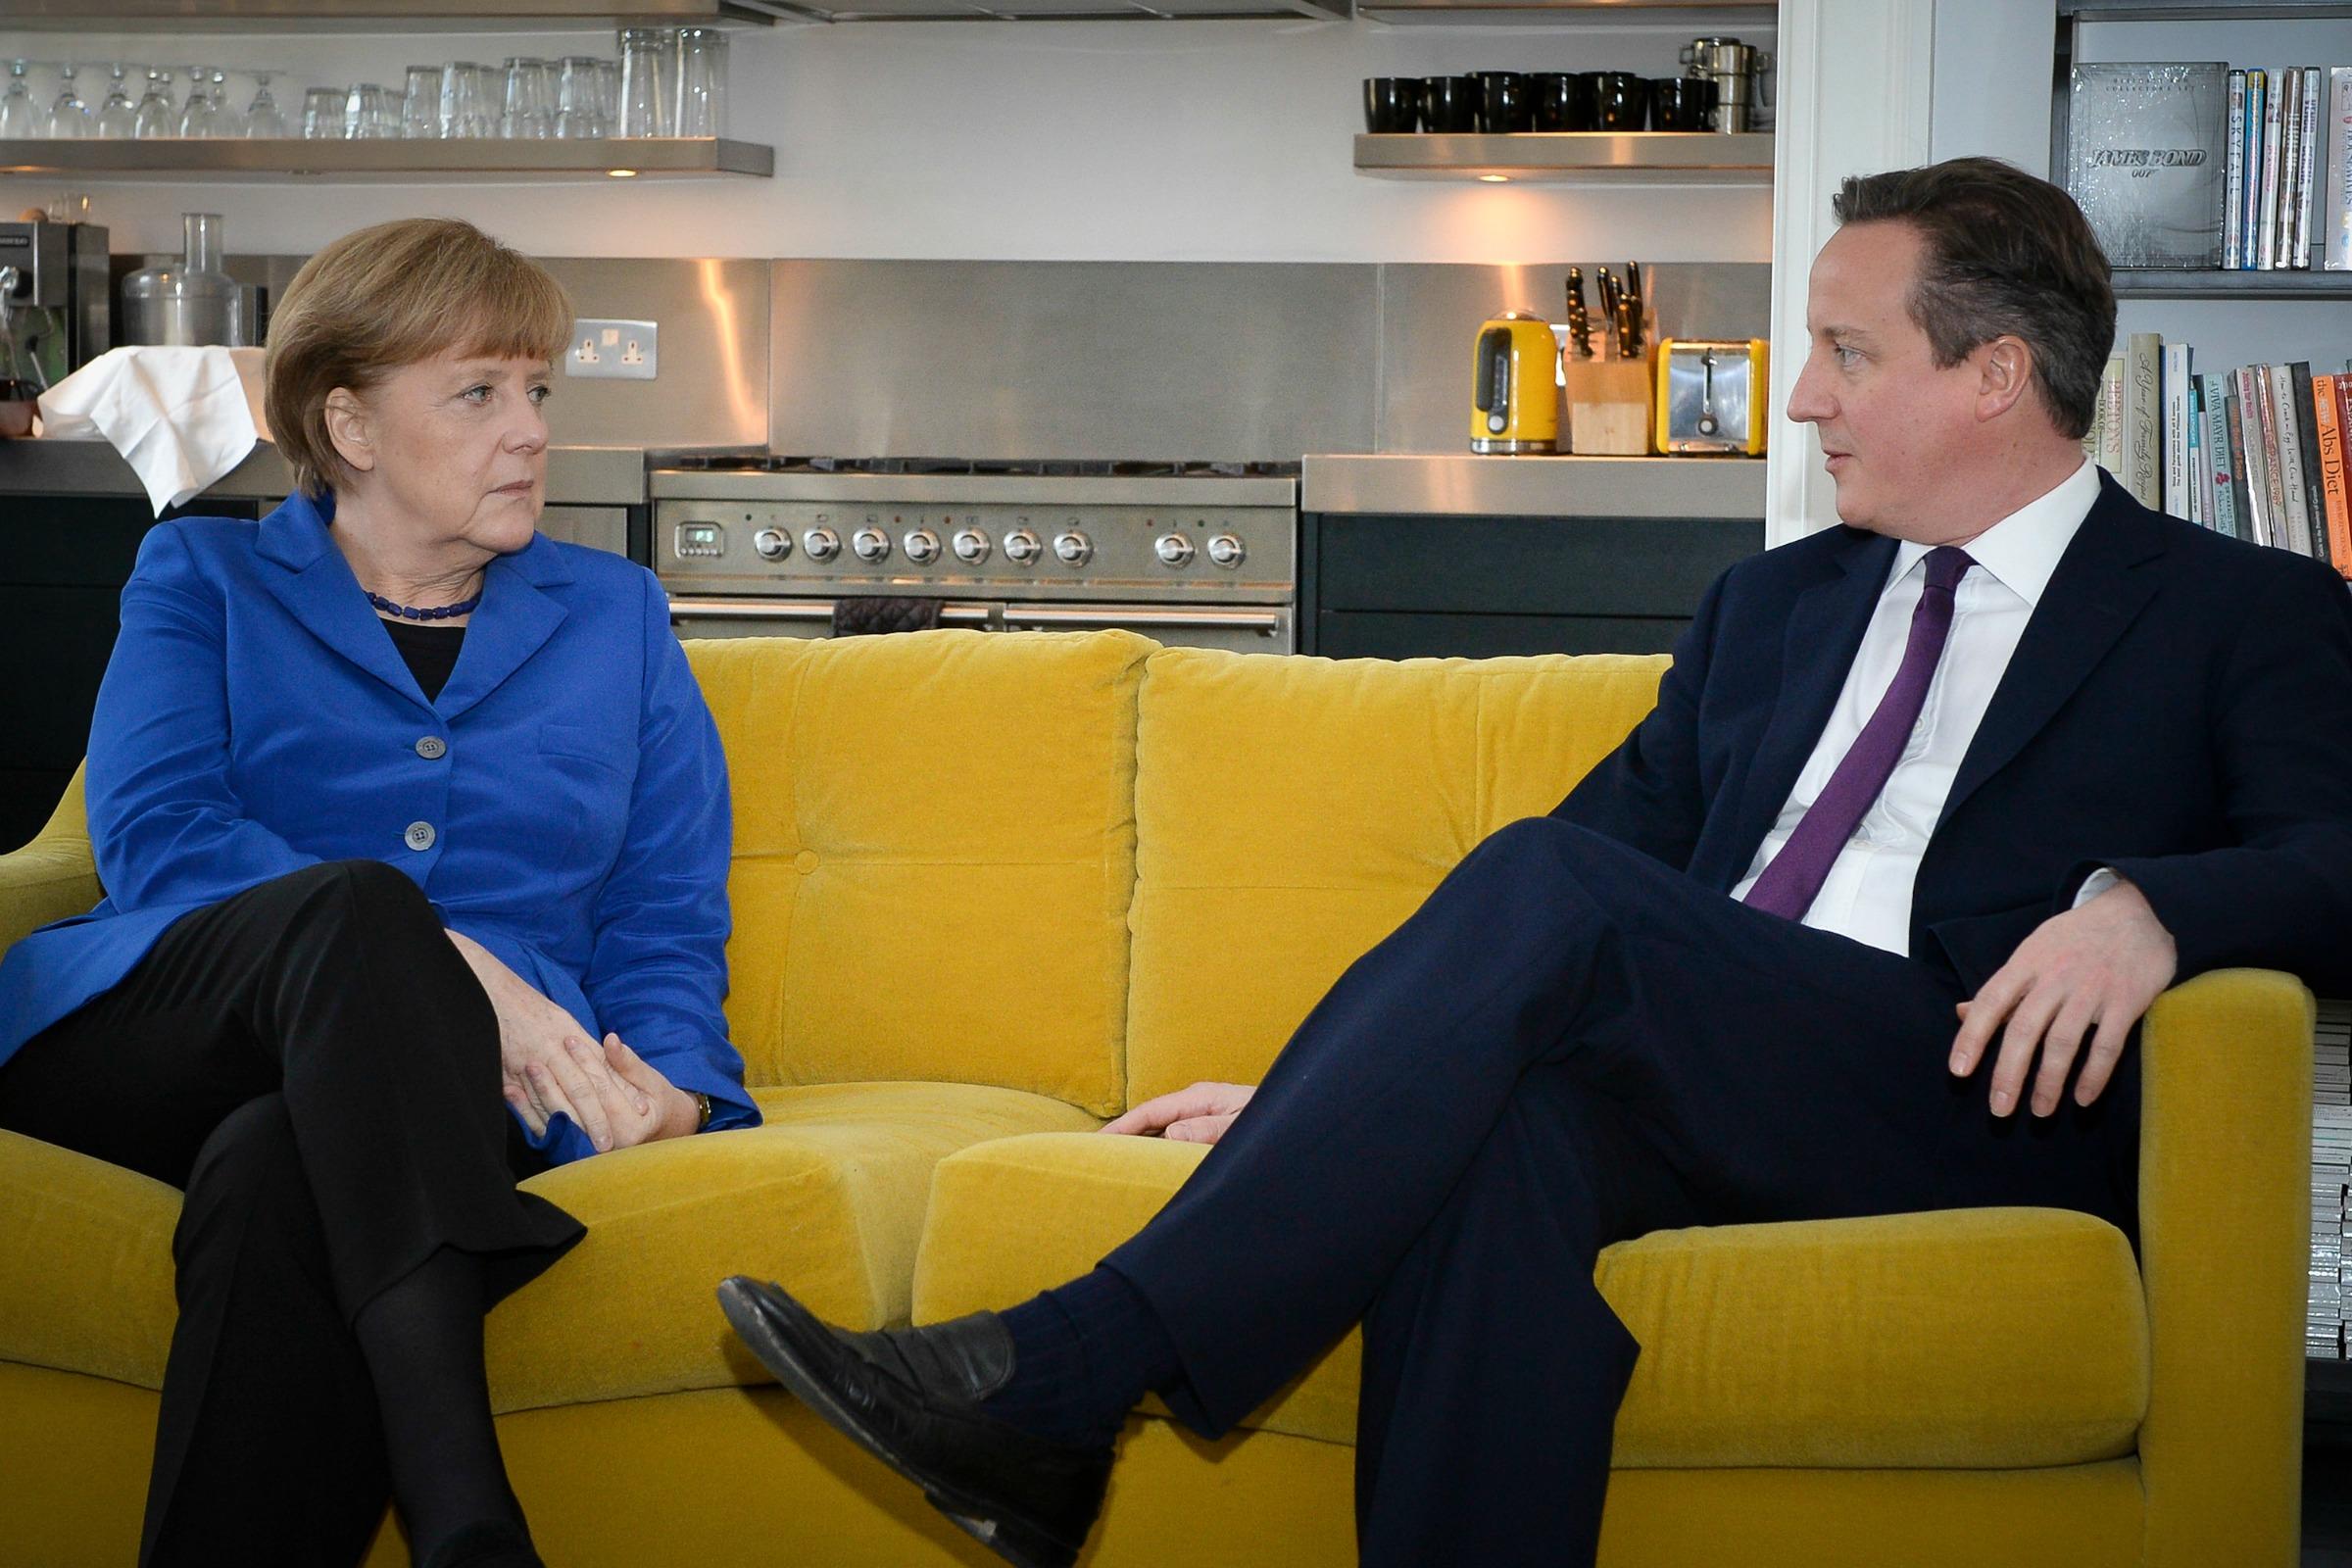 German chancellor Angela Merkel and British PM David Cameron [Number 10/Flickr]